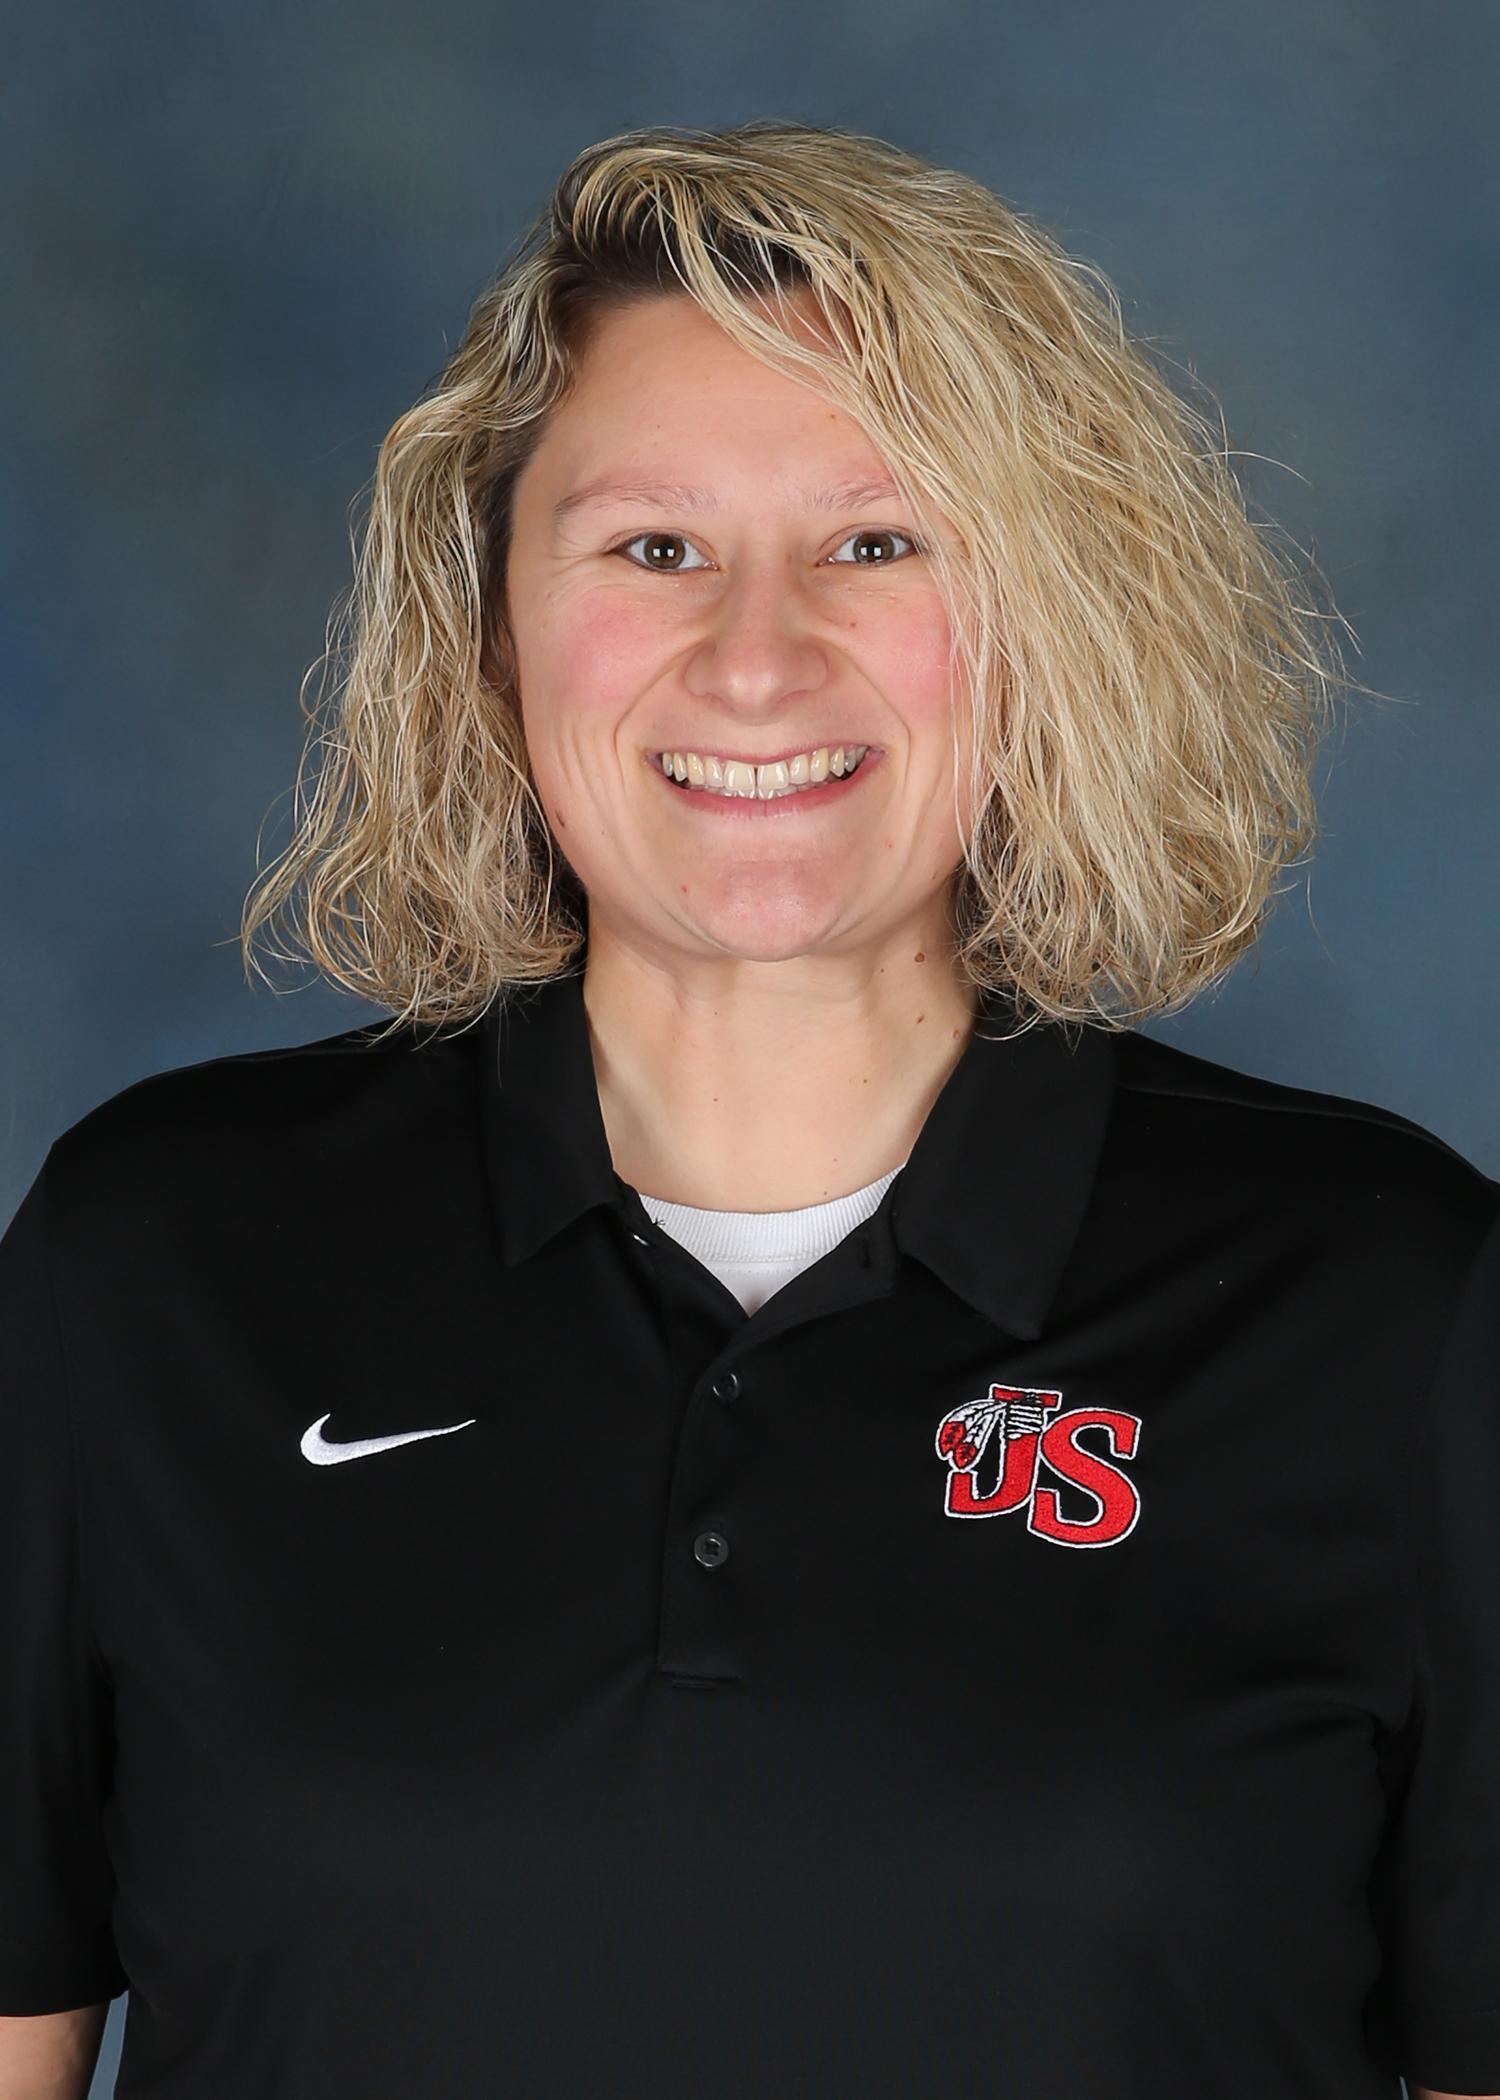 Kayla Mitchell, JV Coach